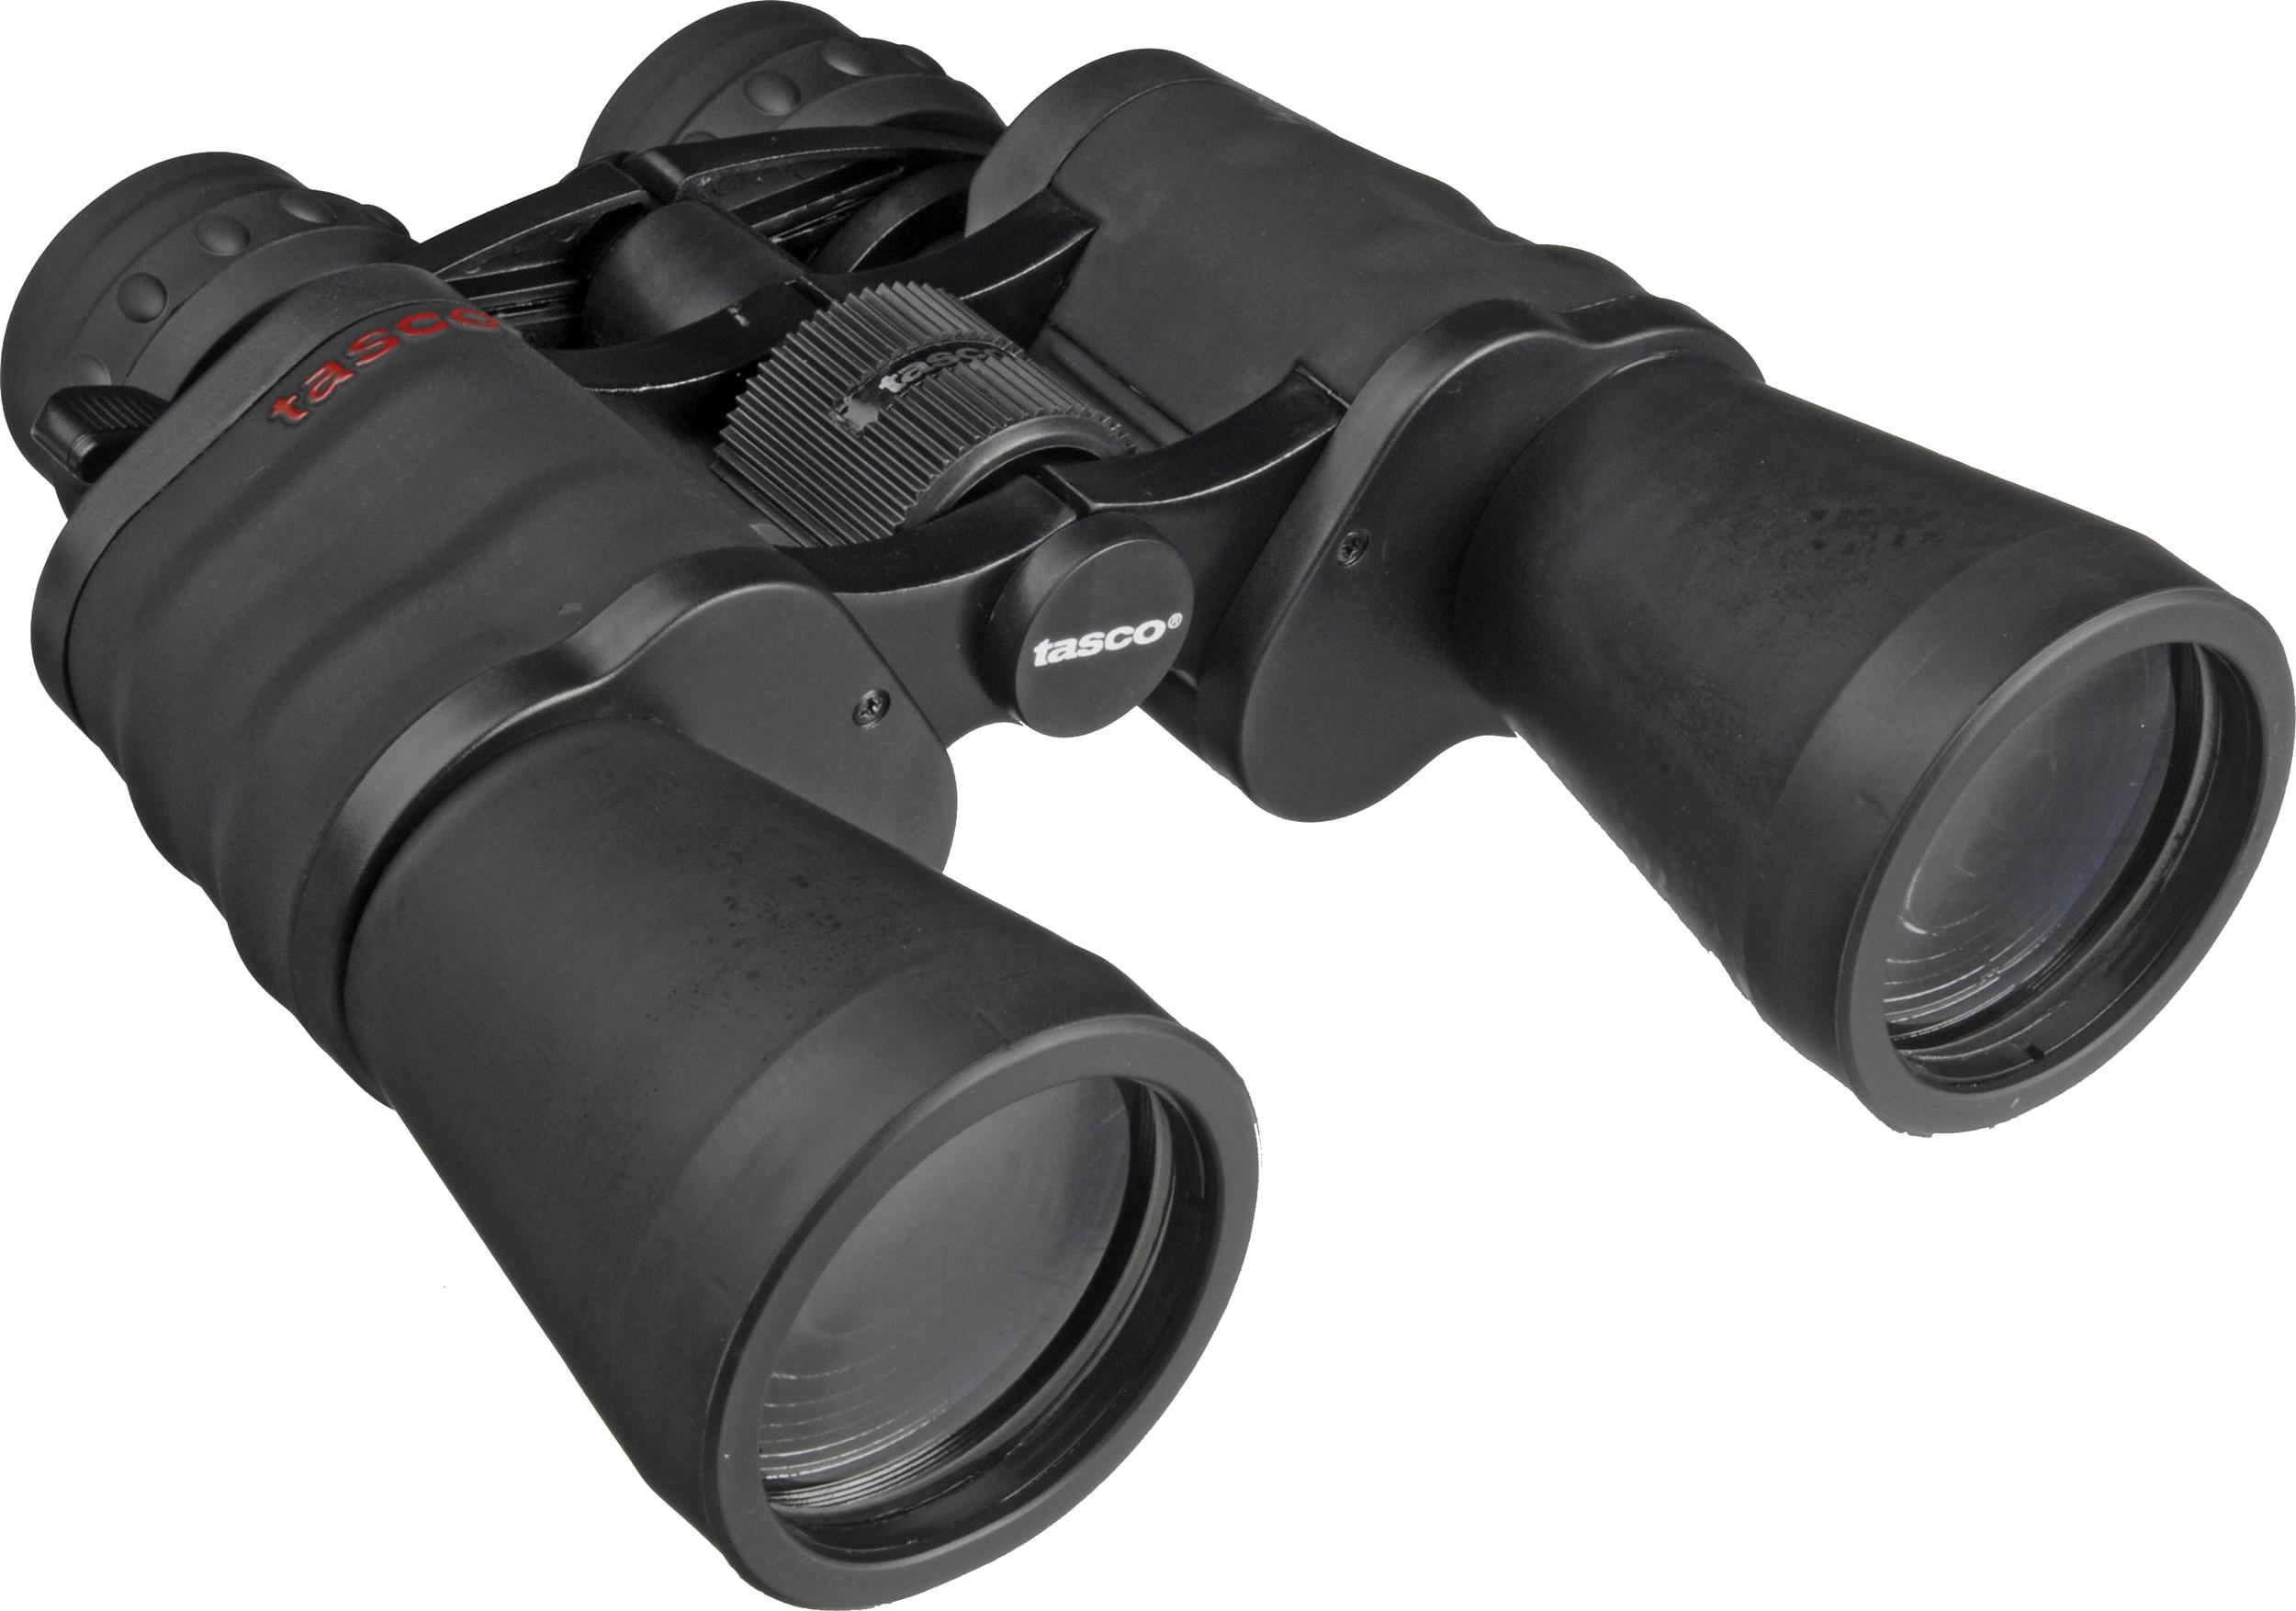 binoculars view png - photo #30